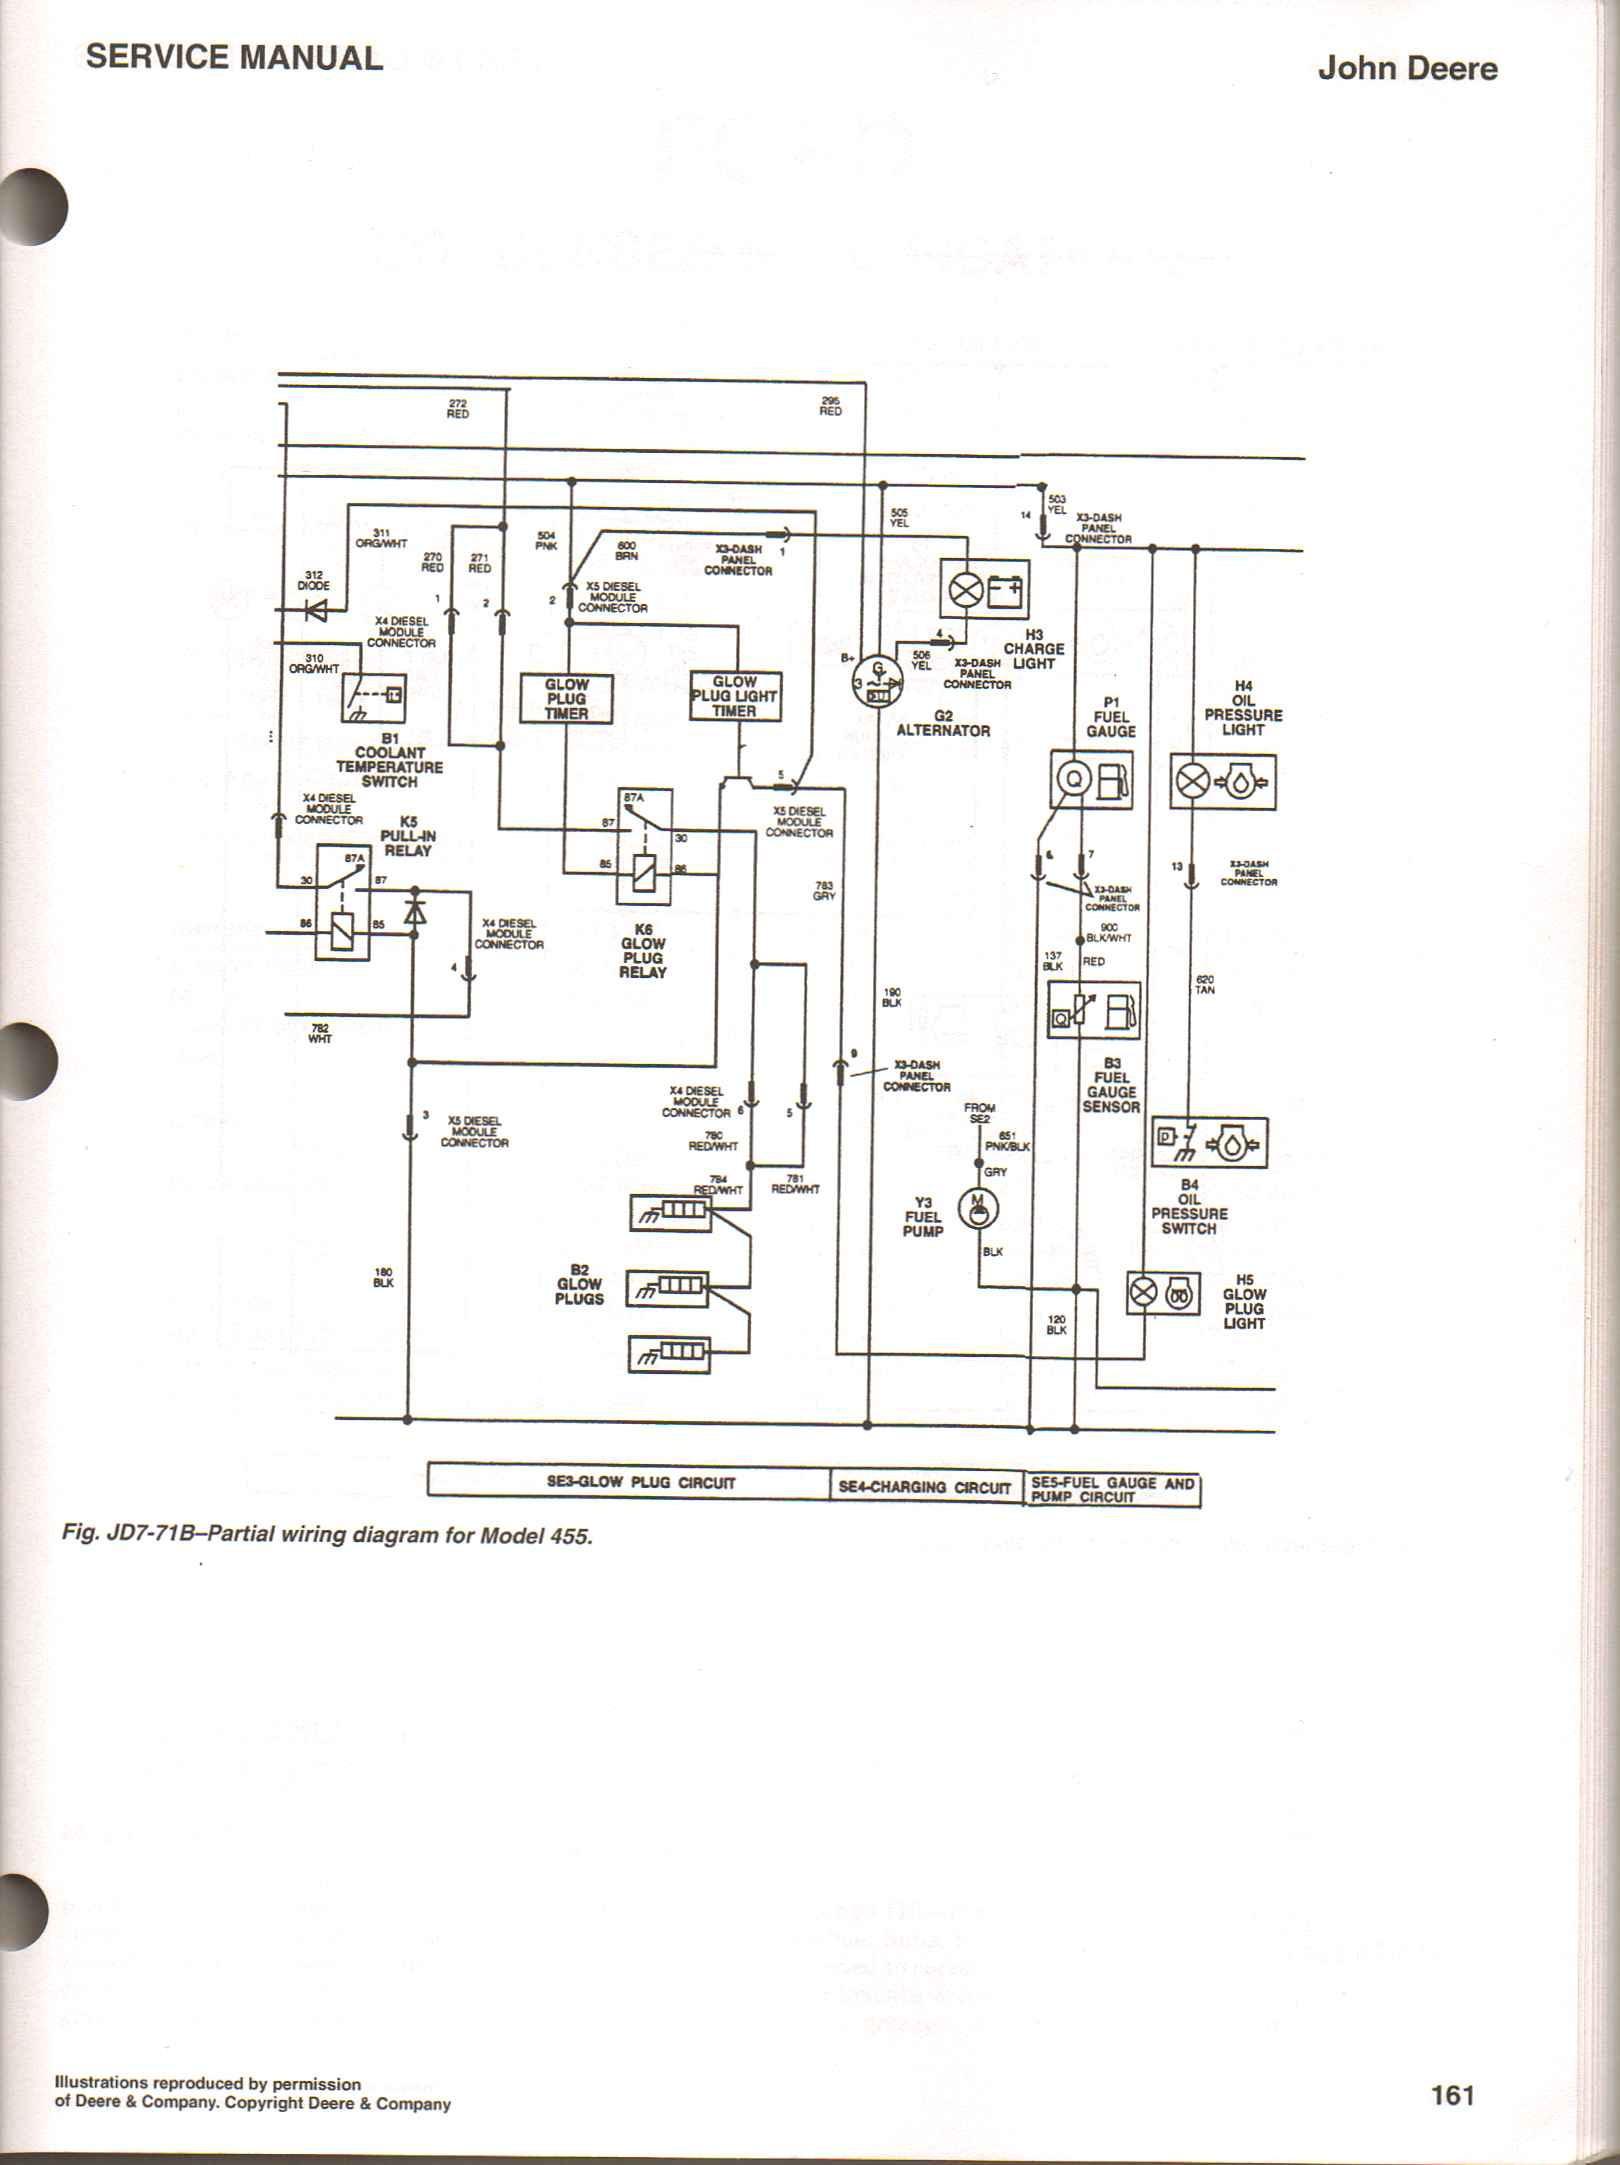 Gage Rr Spreadsheet Of John Deere 4020 Wiring Diagram